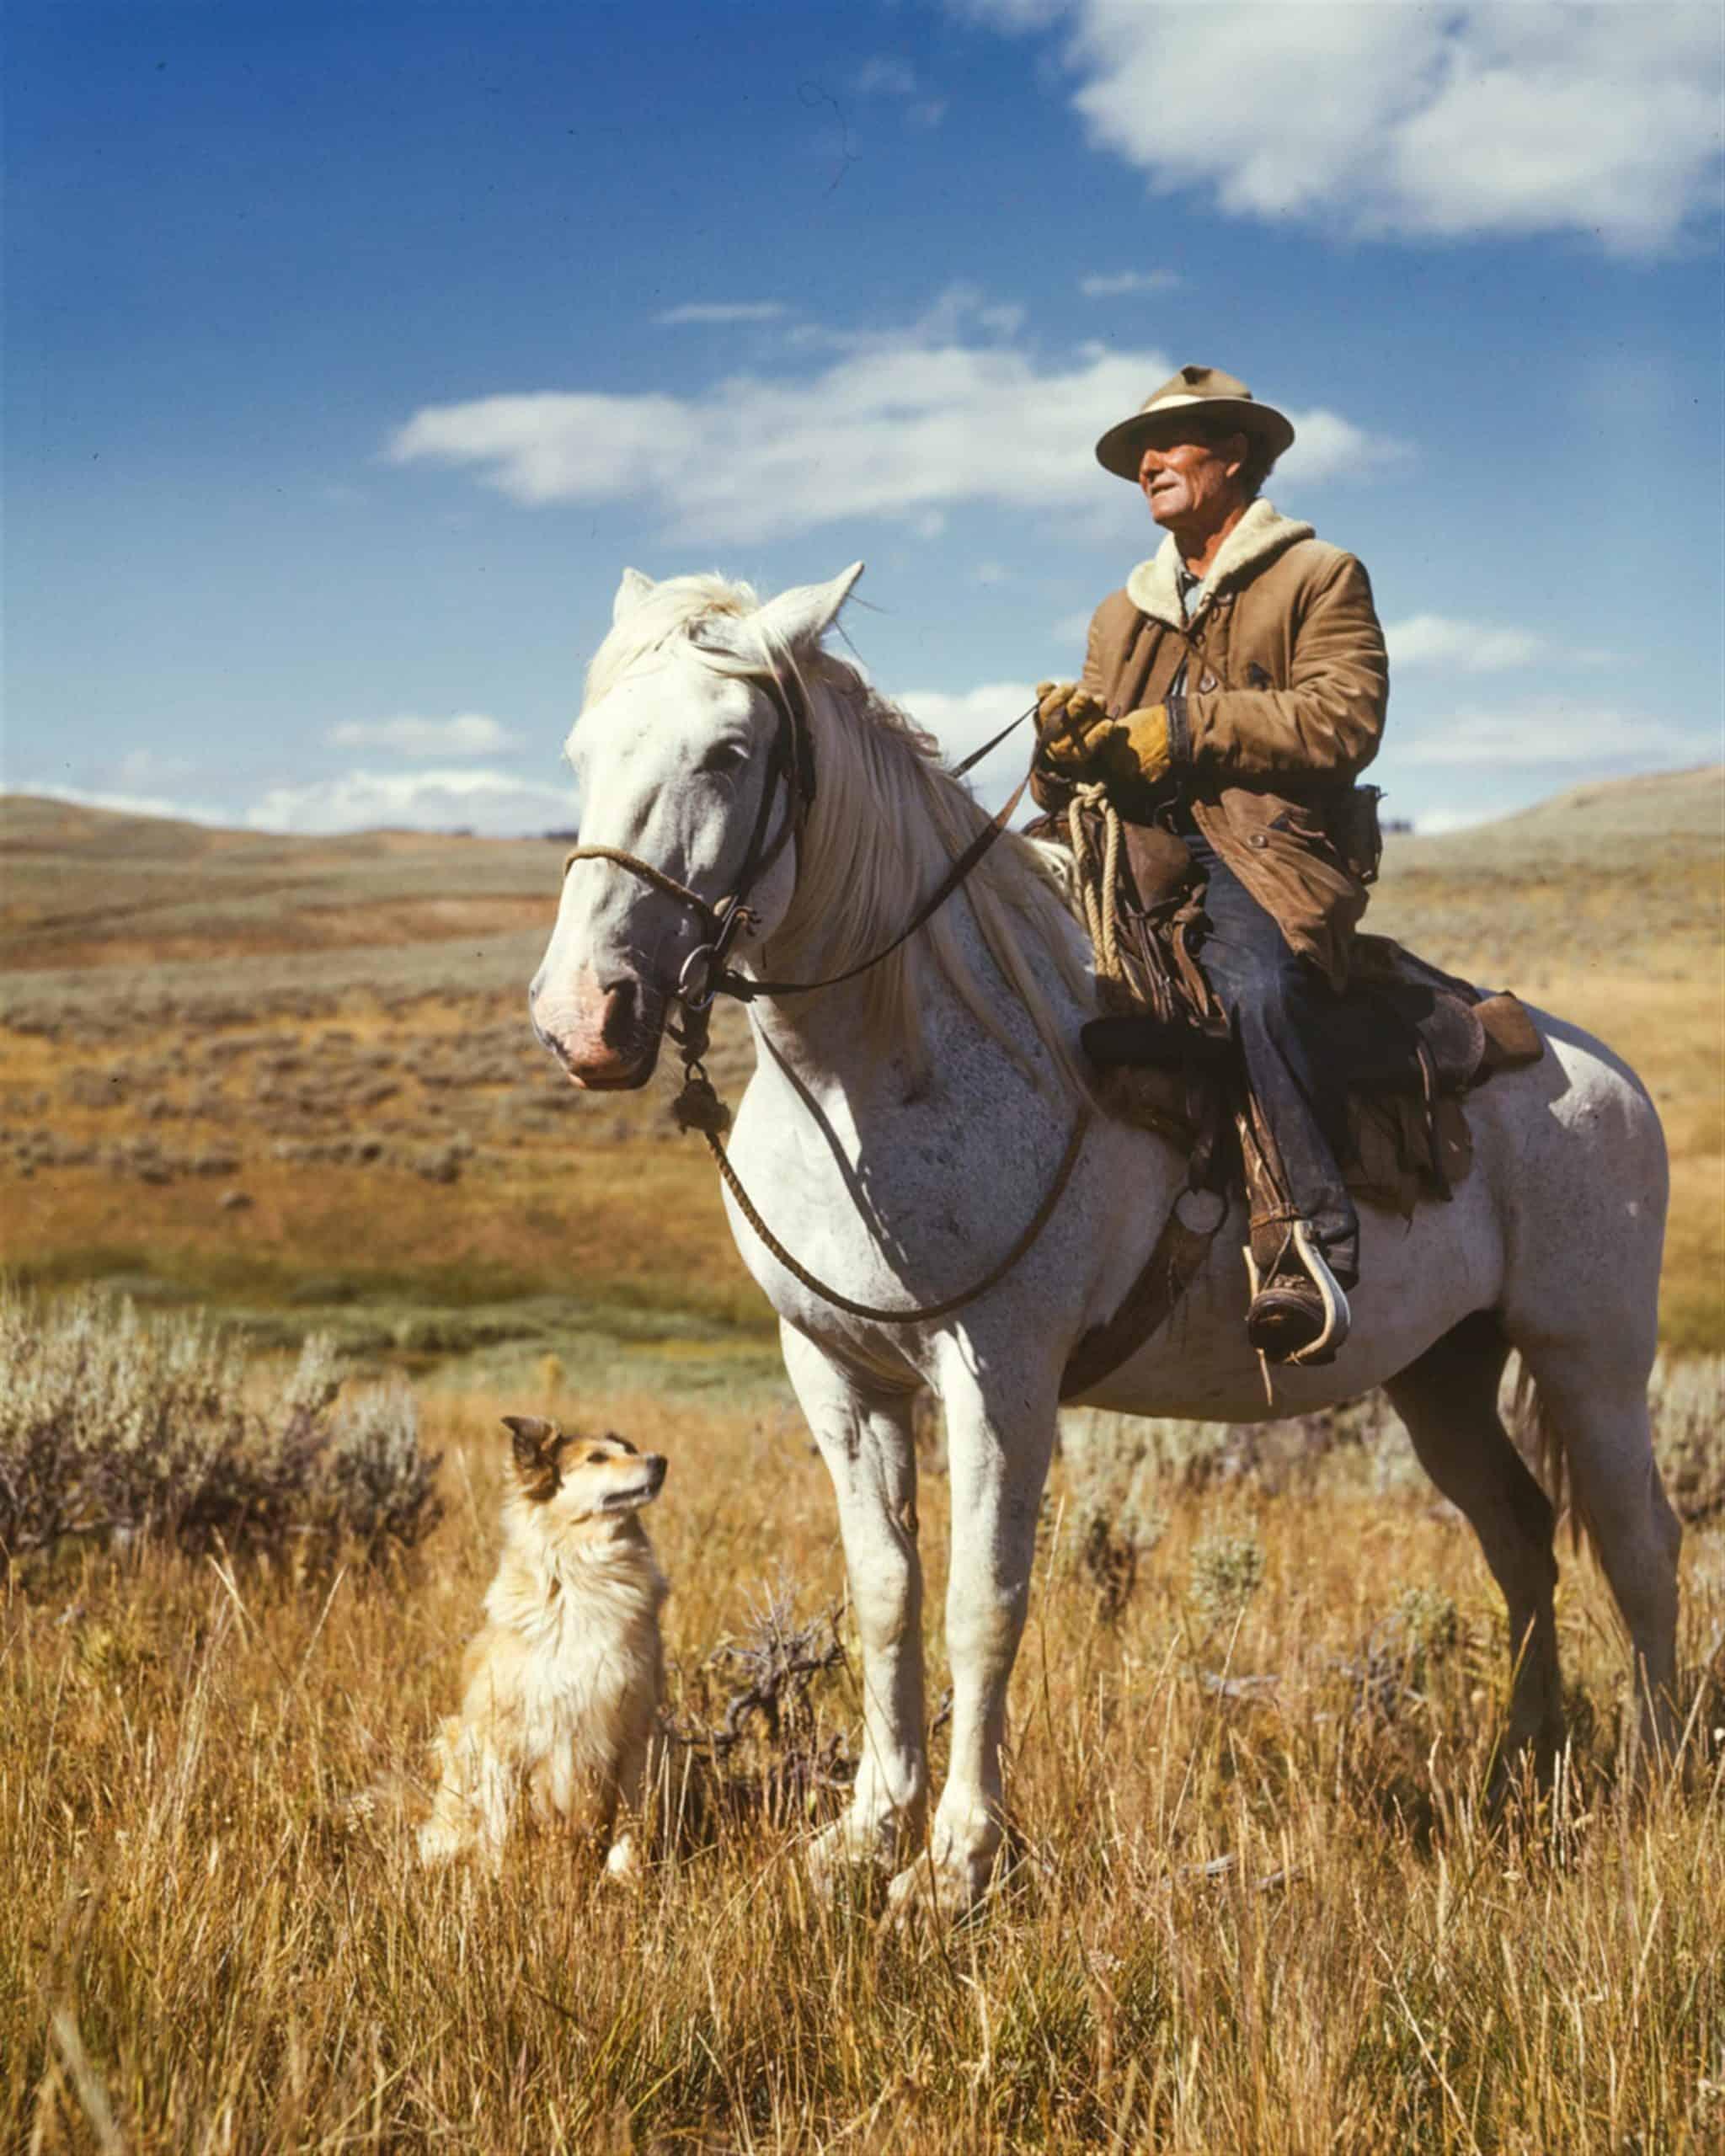 Canva - Farmer Riding a Horse with a Dog